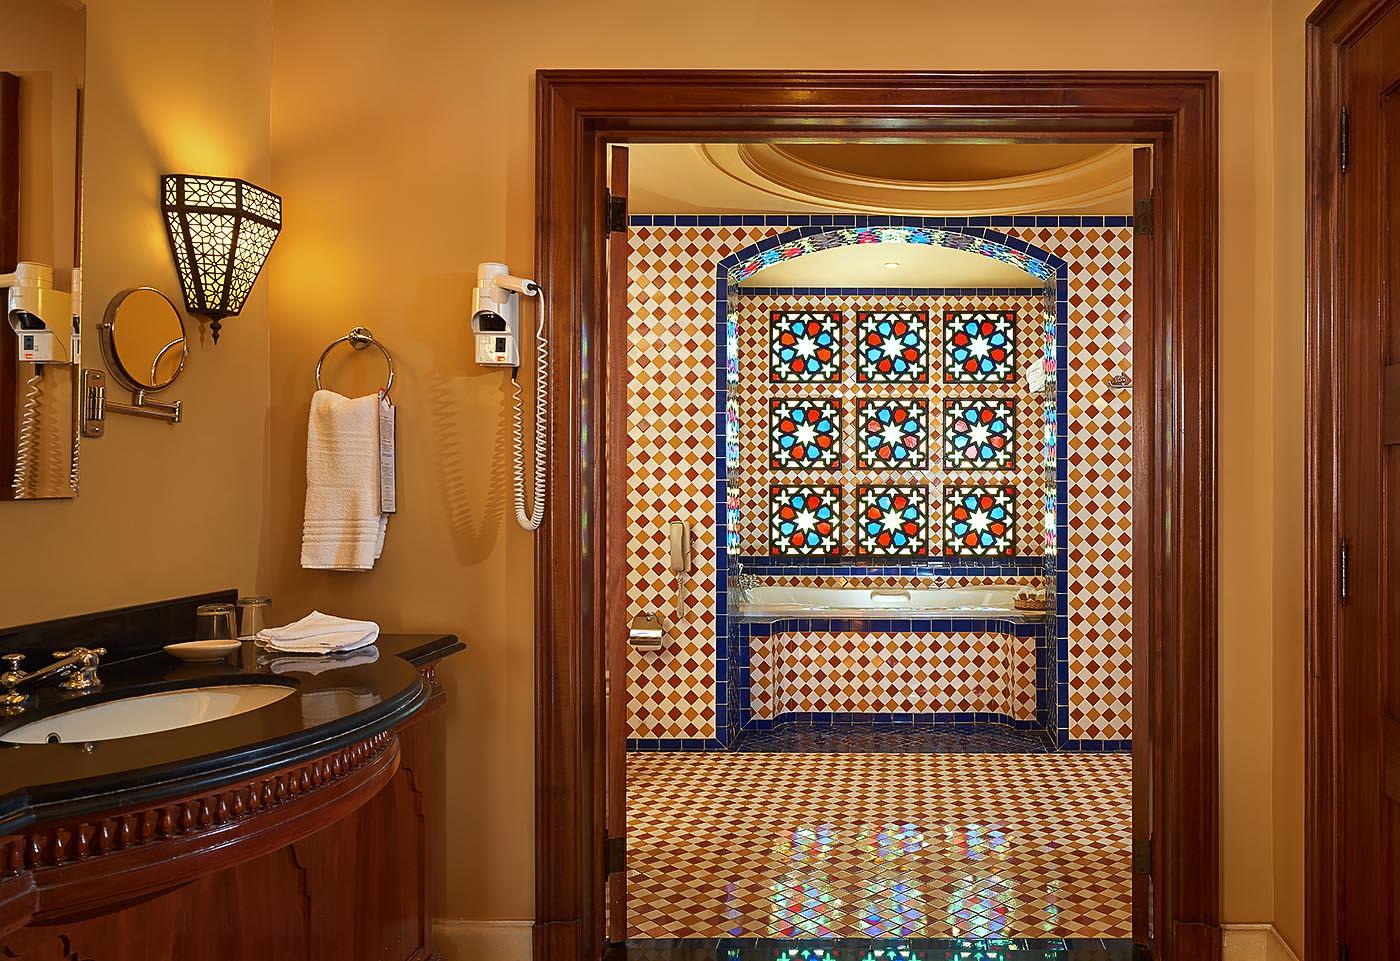 Sofitel Taba heights beach resort Presidential suite bathroom - Mohamed Abdel-Hady photography